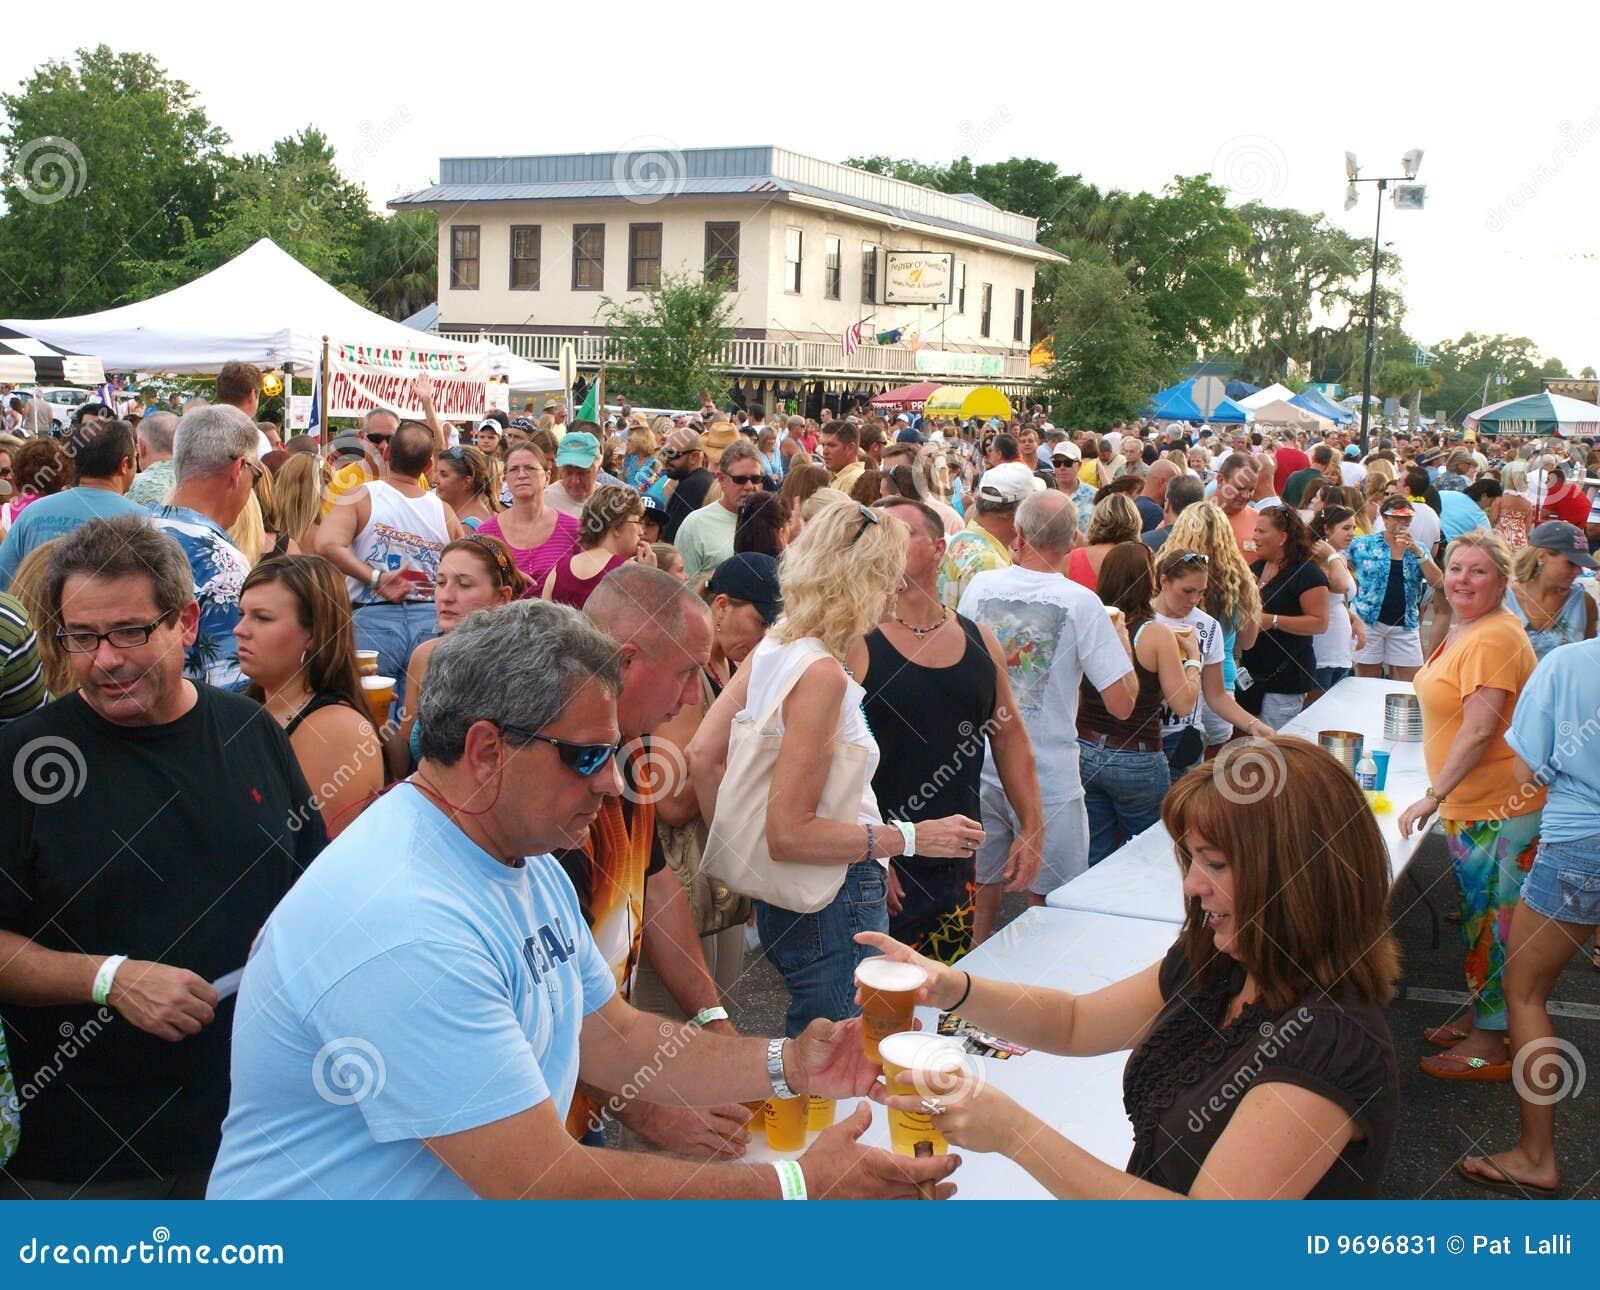 Palm Harbor, FL 6/6/09: Photos taken at the annual Parrot Head block ...